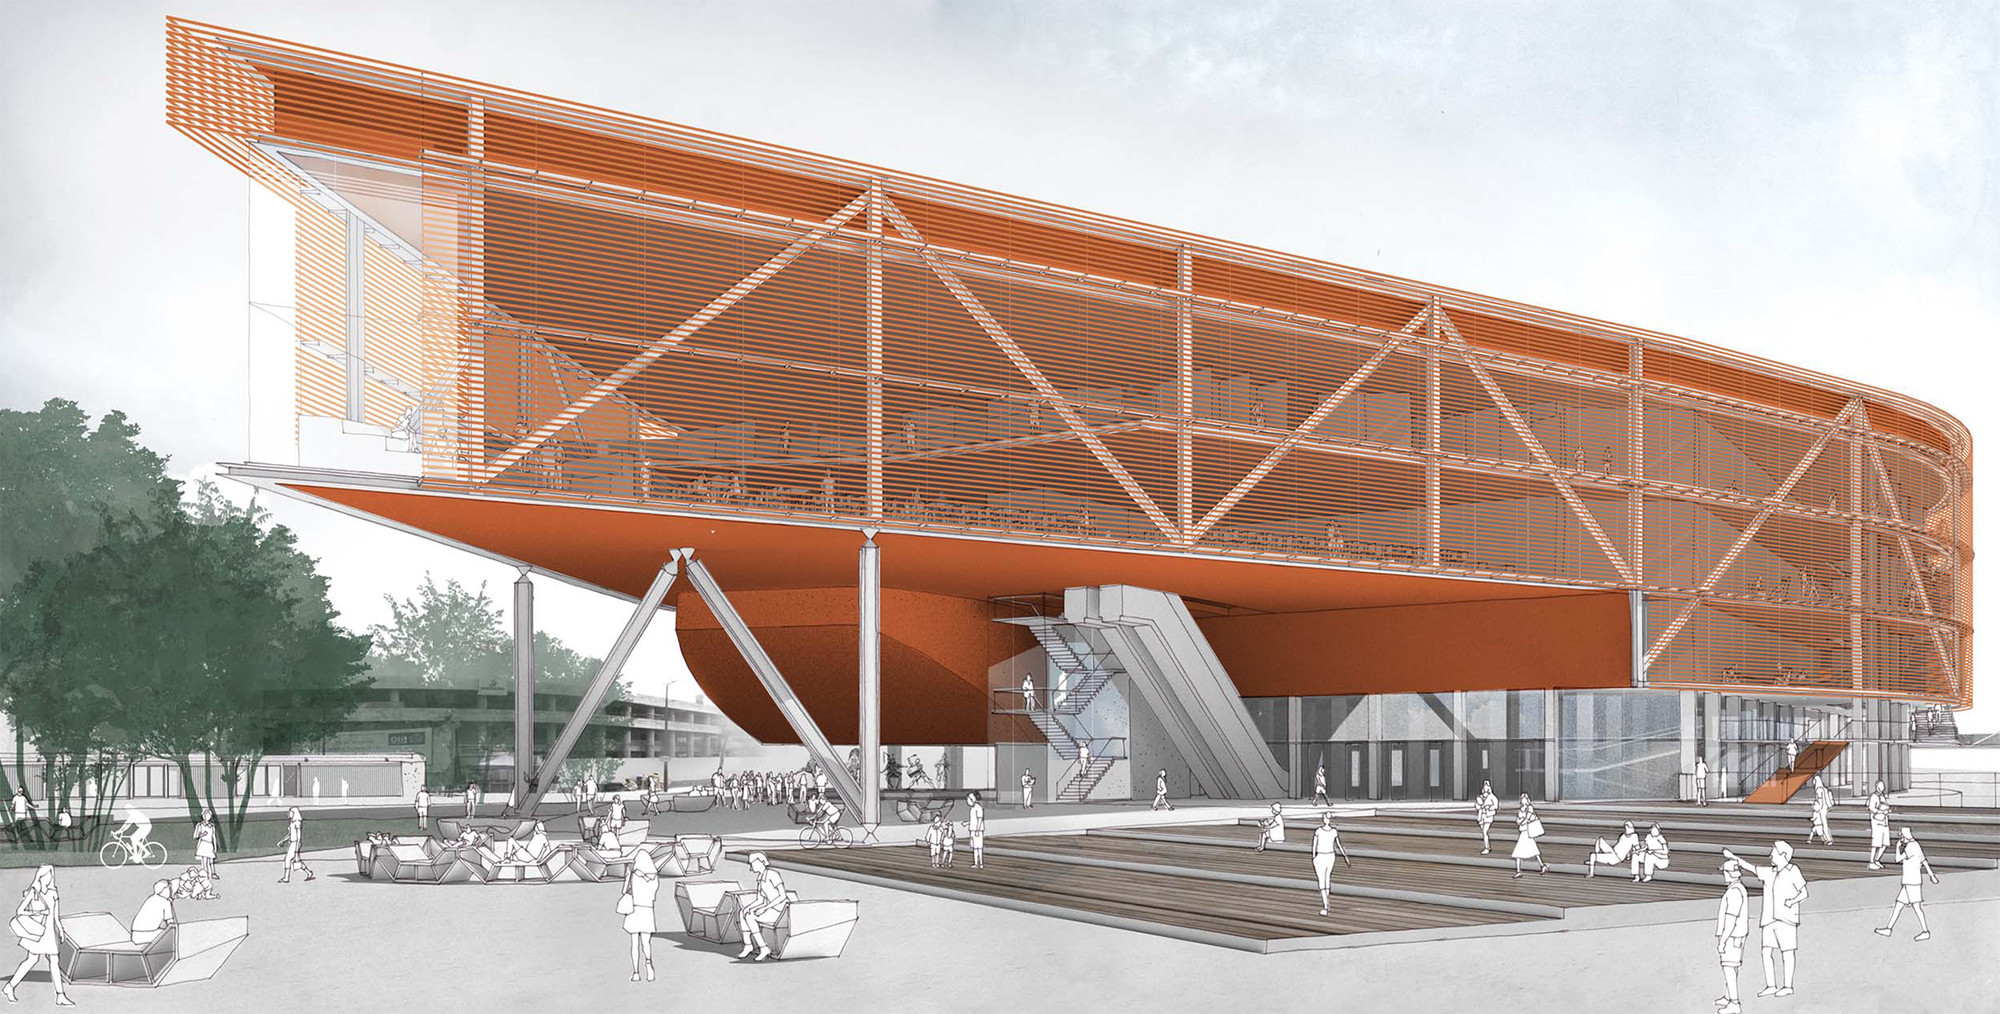 Resultado do Concurso Anexo da Biblioteca Nacional, Primeiro Lugar - Hector Vigliecca . Image Cortesia de IAB-RJ